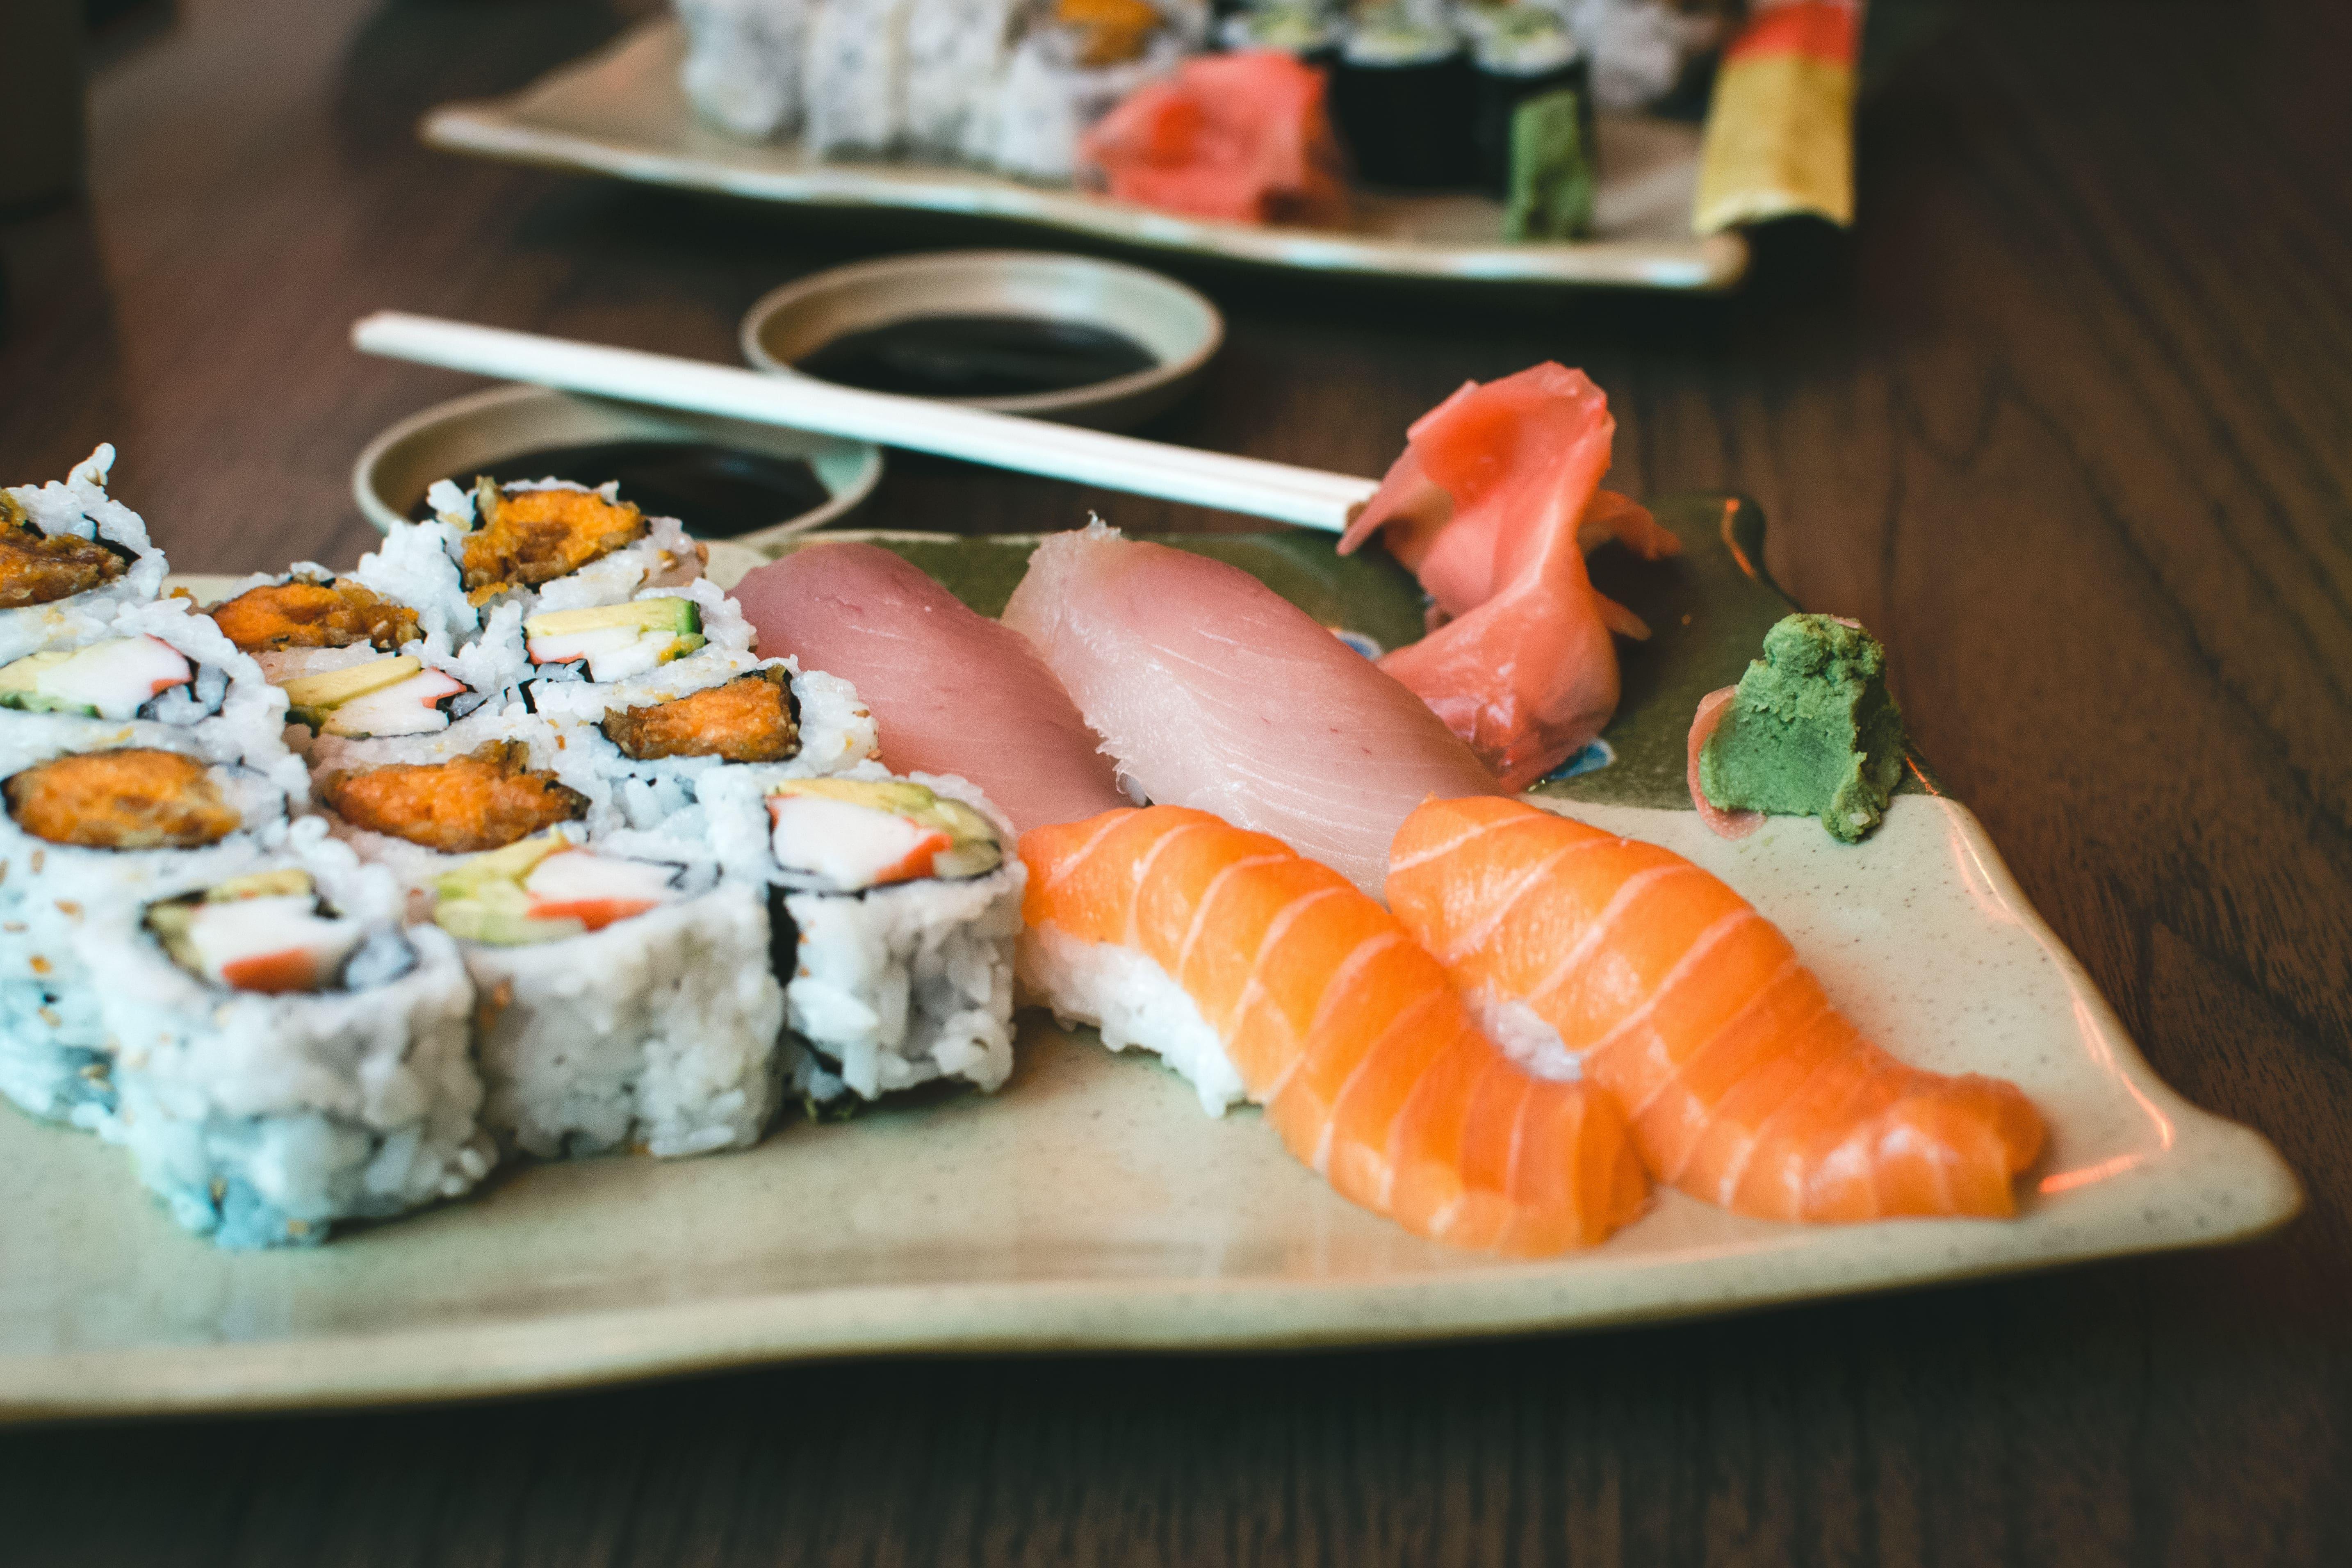 picography-fresh-sushi-yam-california-rolls-jakub-kapusnak-1-min